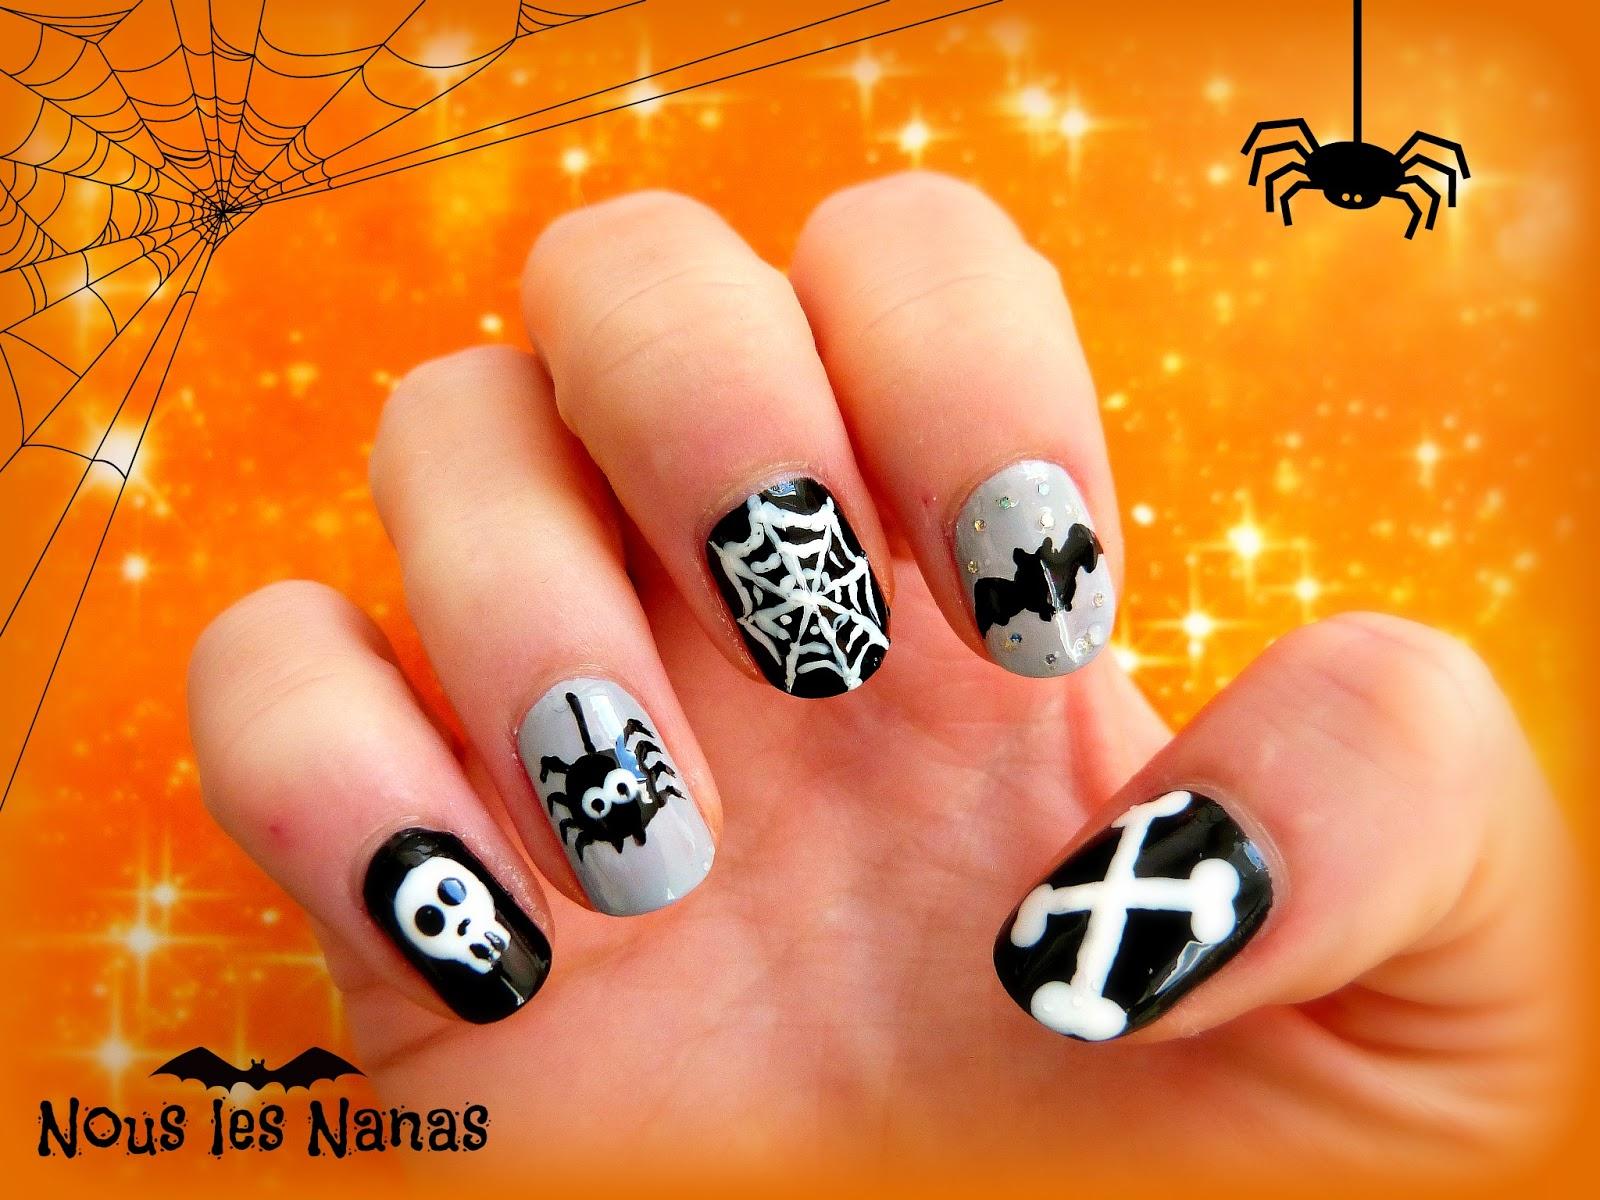 manucure fête halloween. Manucure Halloween noire